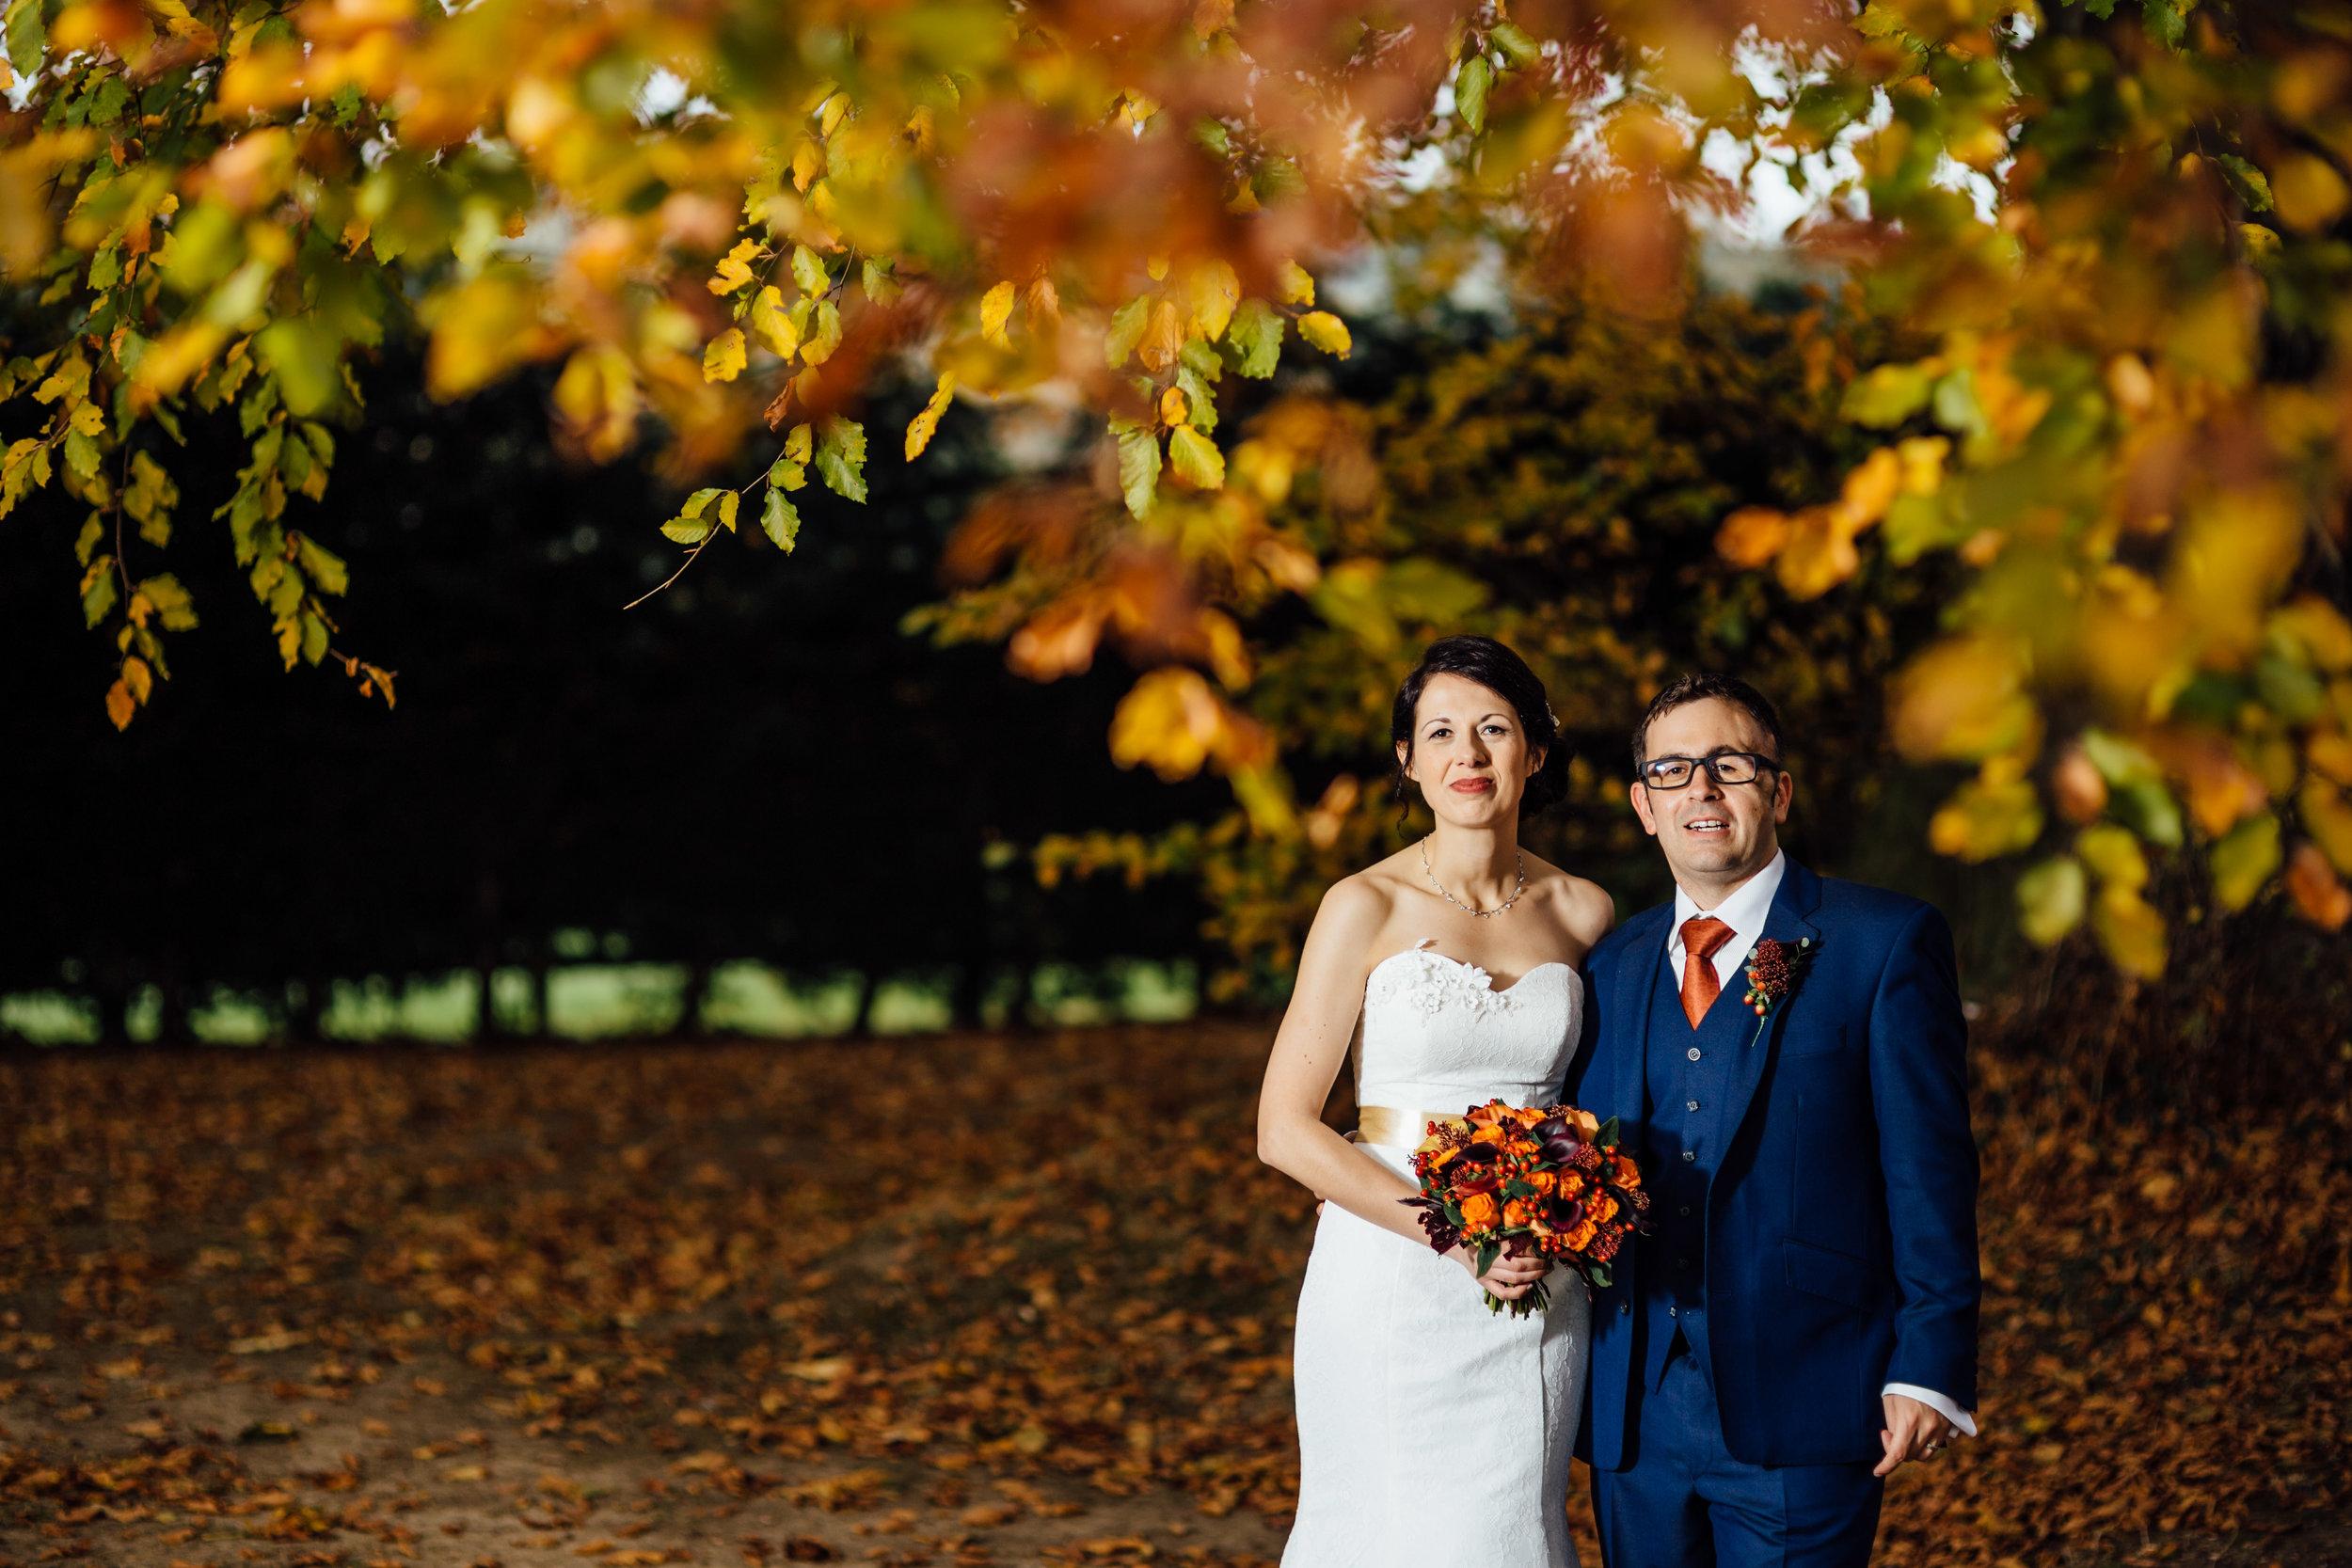 Autumn bridal bouquet Autumnal wedding flowers by Tineke Floral Designs in Derbyshire.